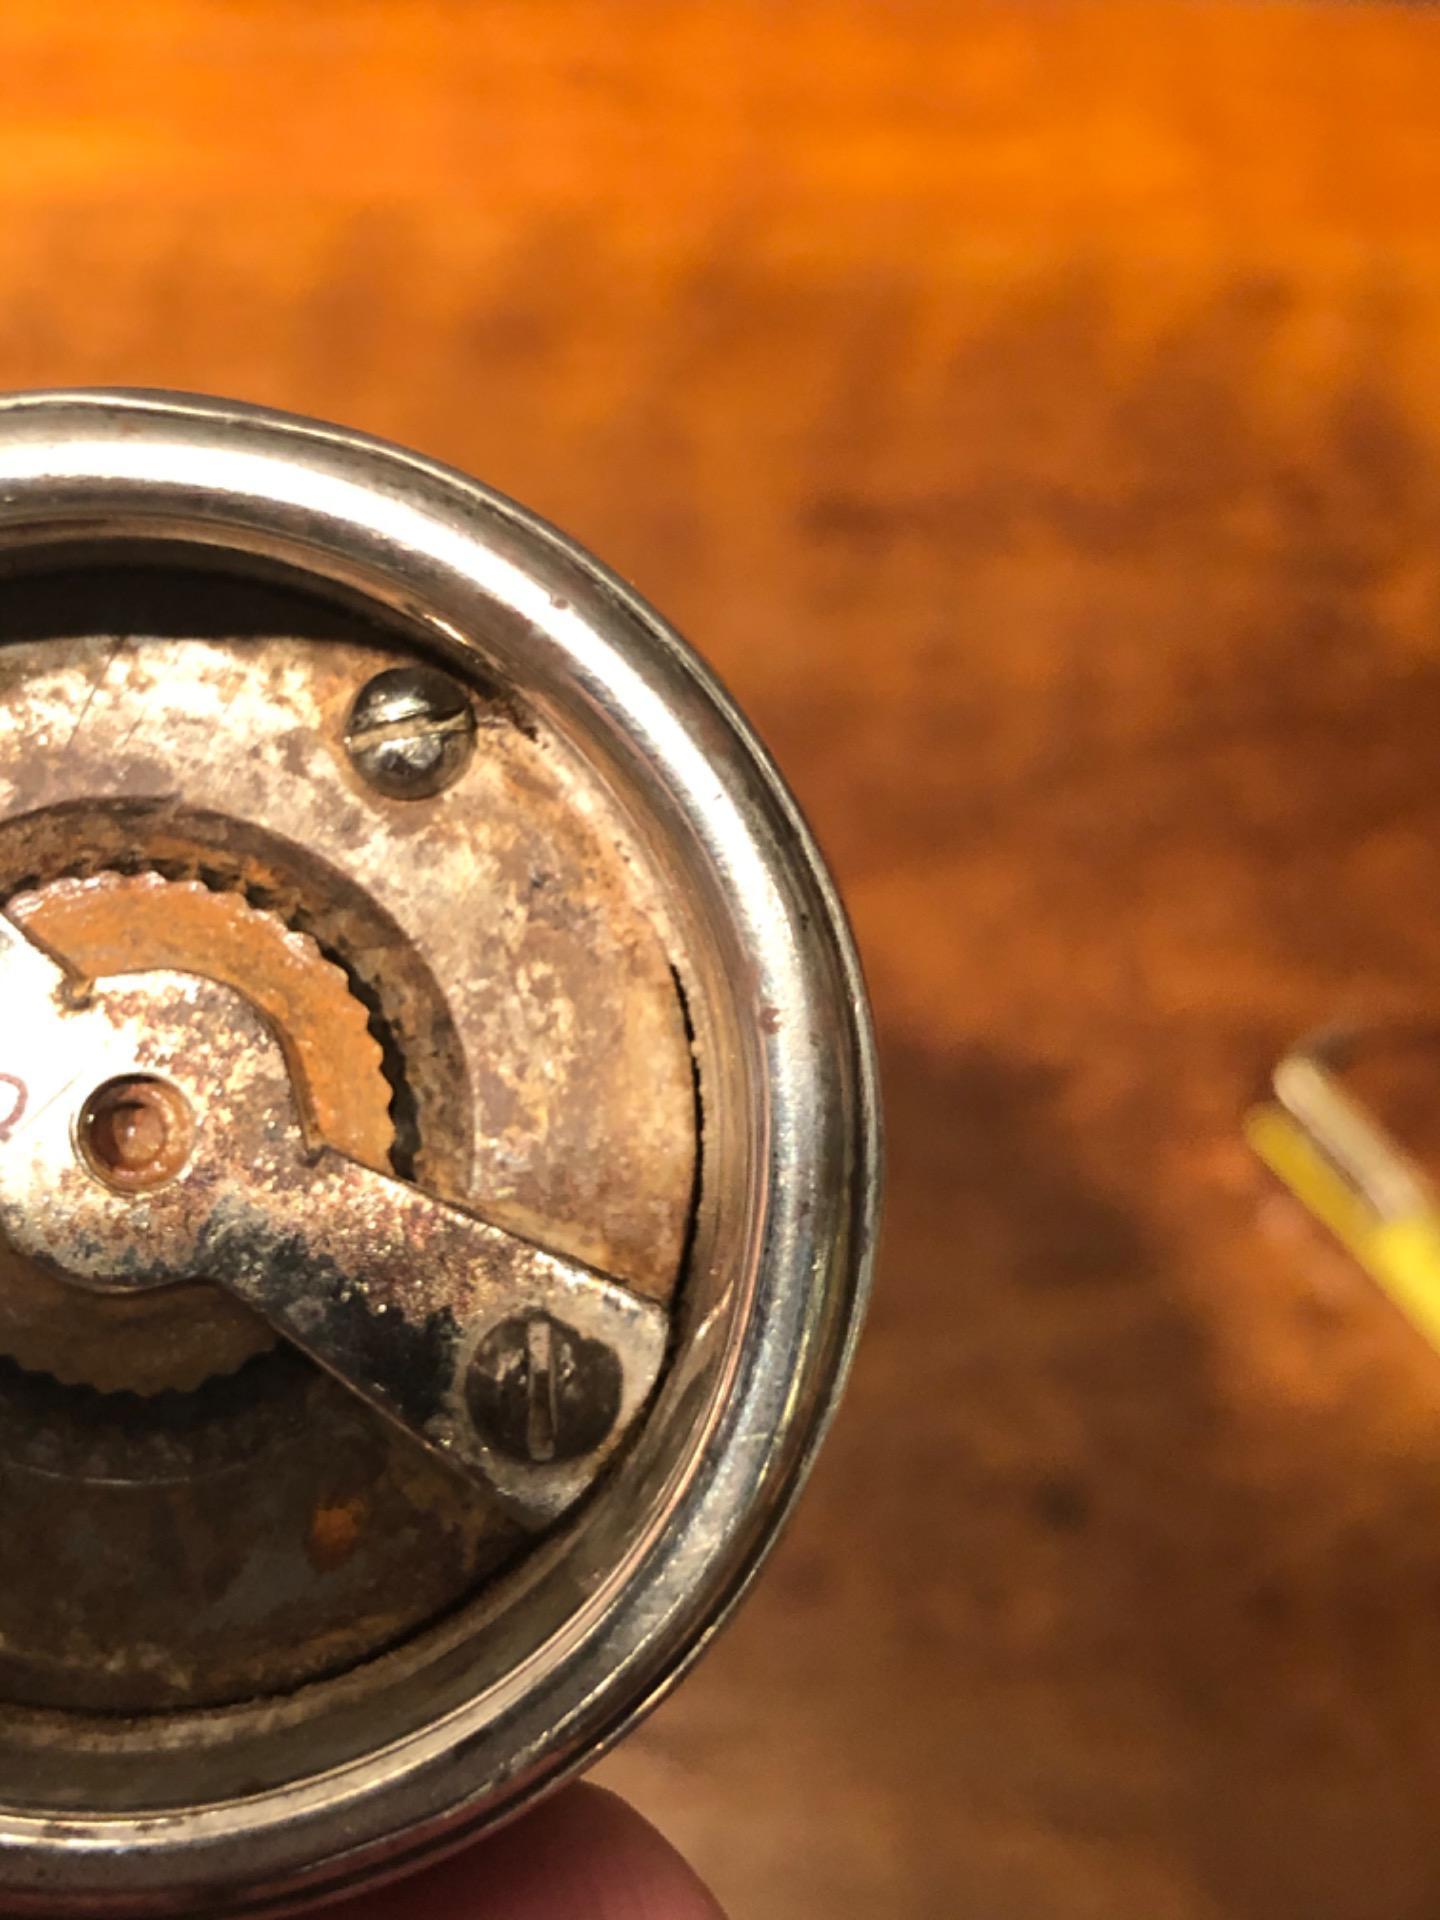 thumb2|Macinapepe in argento punzone Sterling.USA.